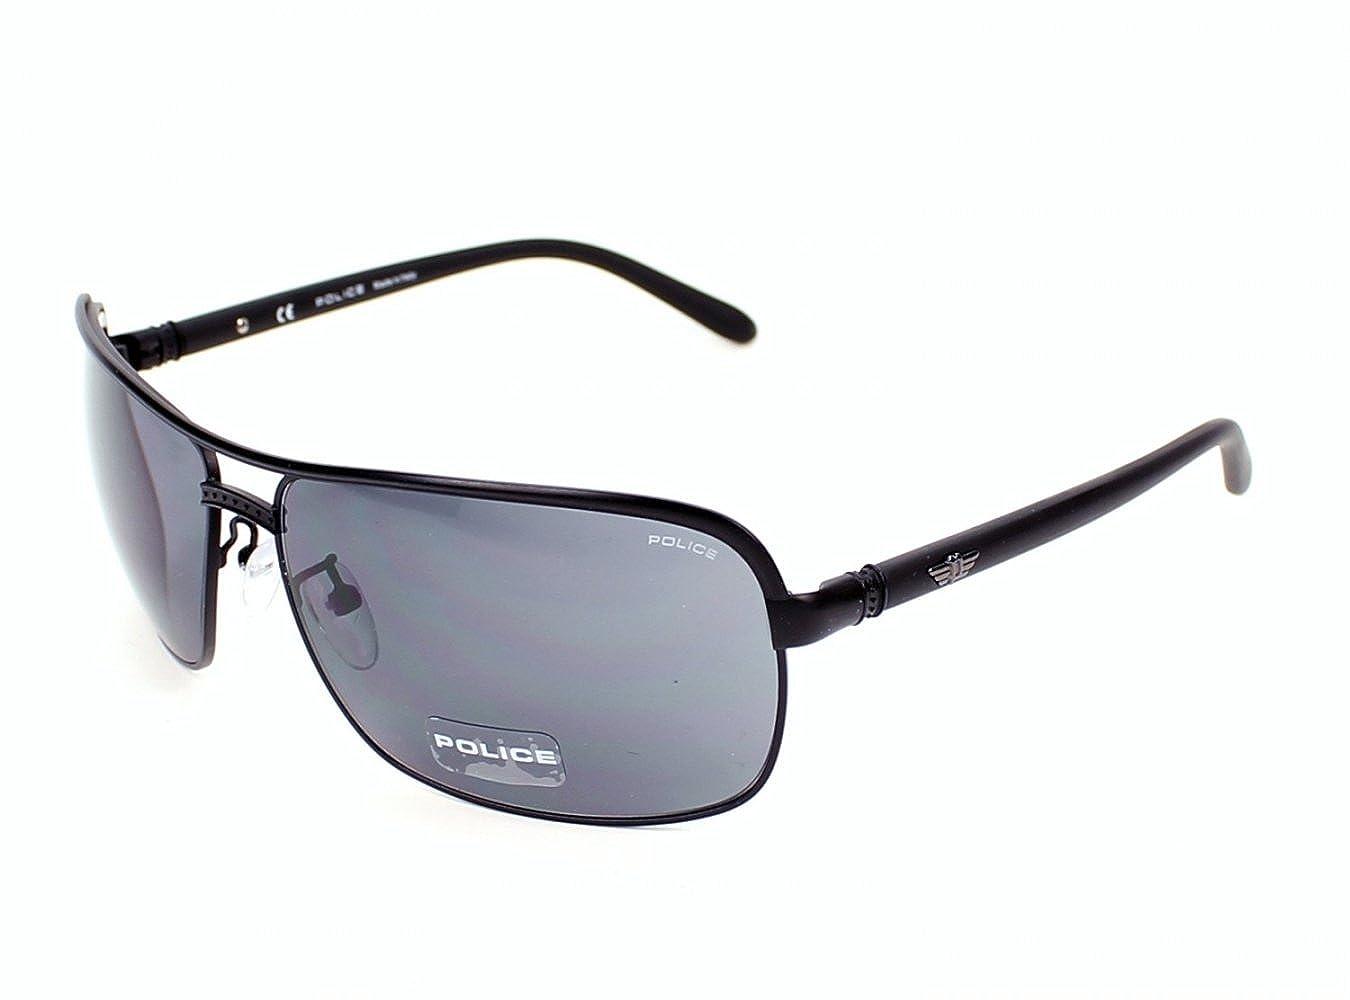 8fc97768d4 Police sunglasses S 8852 0531 Metal Matt Black Grey  Amazon.co.uk  Clothing